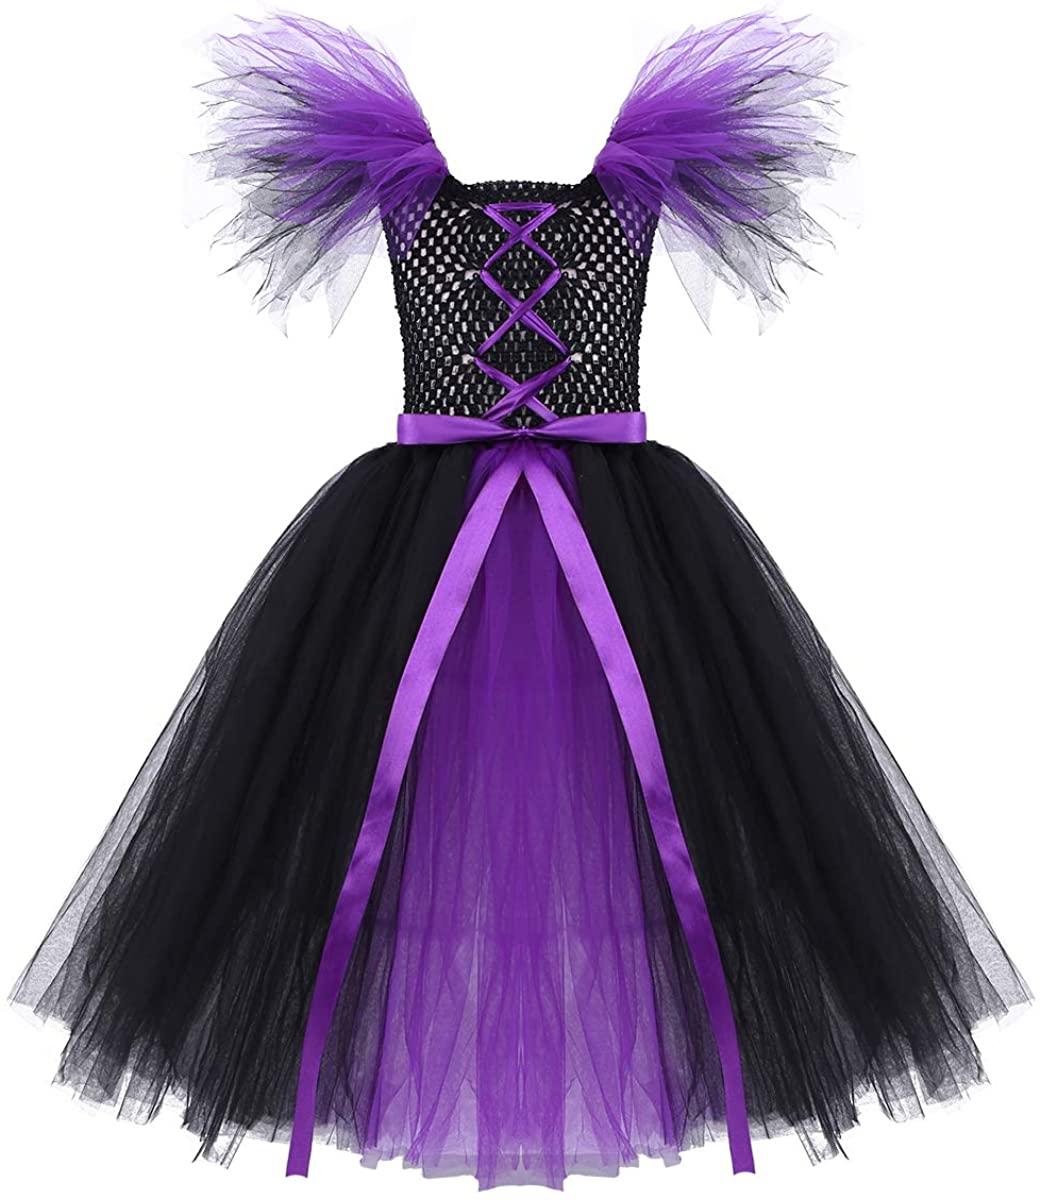 ACSUSS Kids Girls Fairy Tale Princess Tutu Dress Halloween Cosplay Costumes Fancy Dress Up Mystical Quee Witch Dress